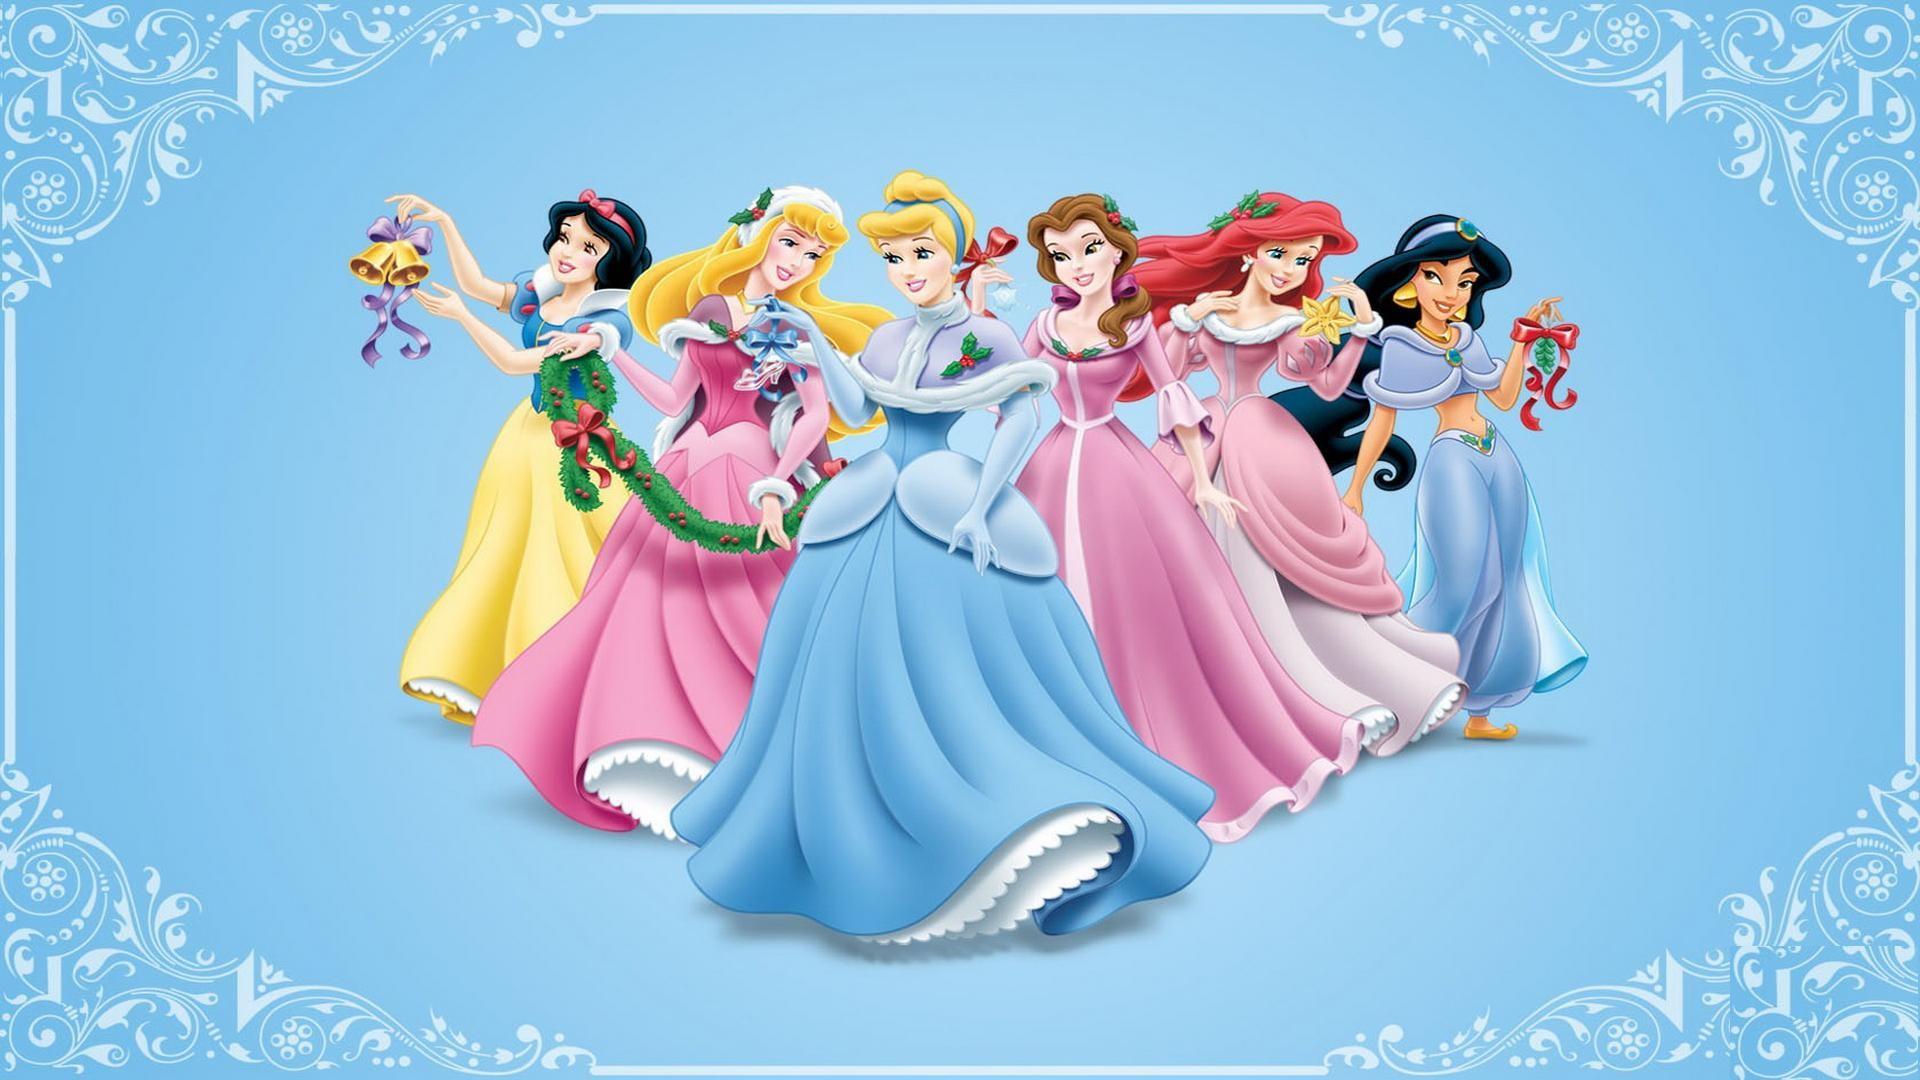 Disney Princess Computer Wallpapers (50 Wallpapers) – Adorable Wallpapers